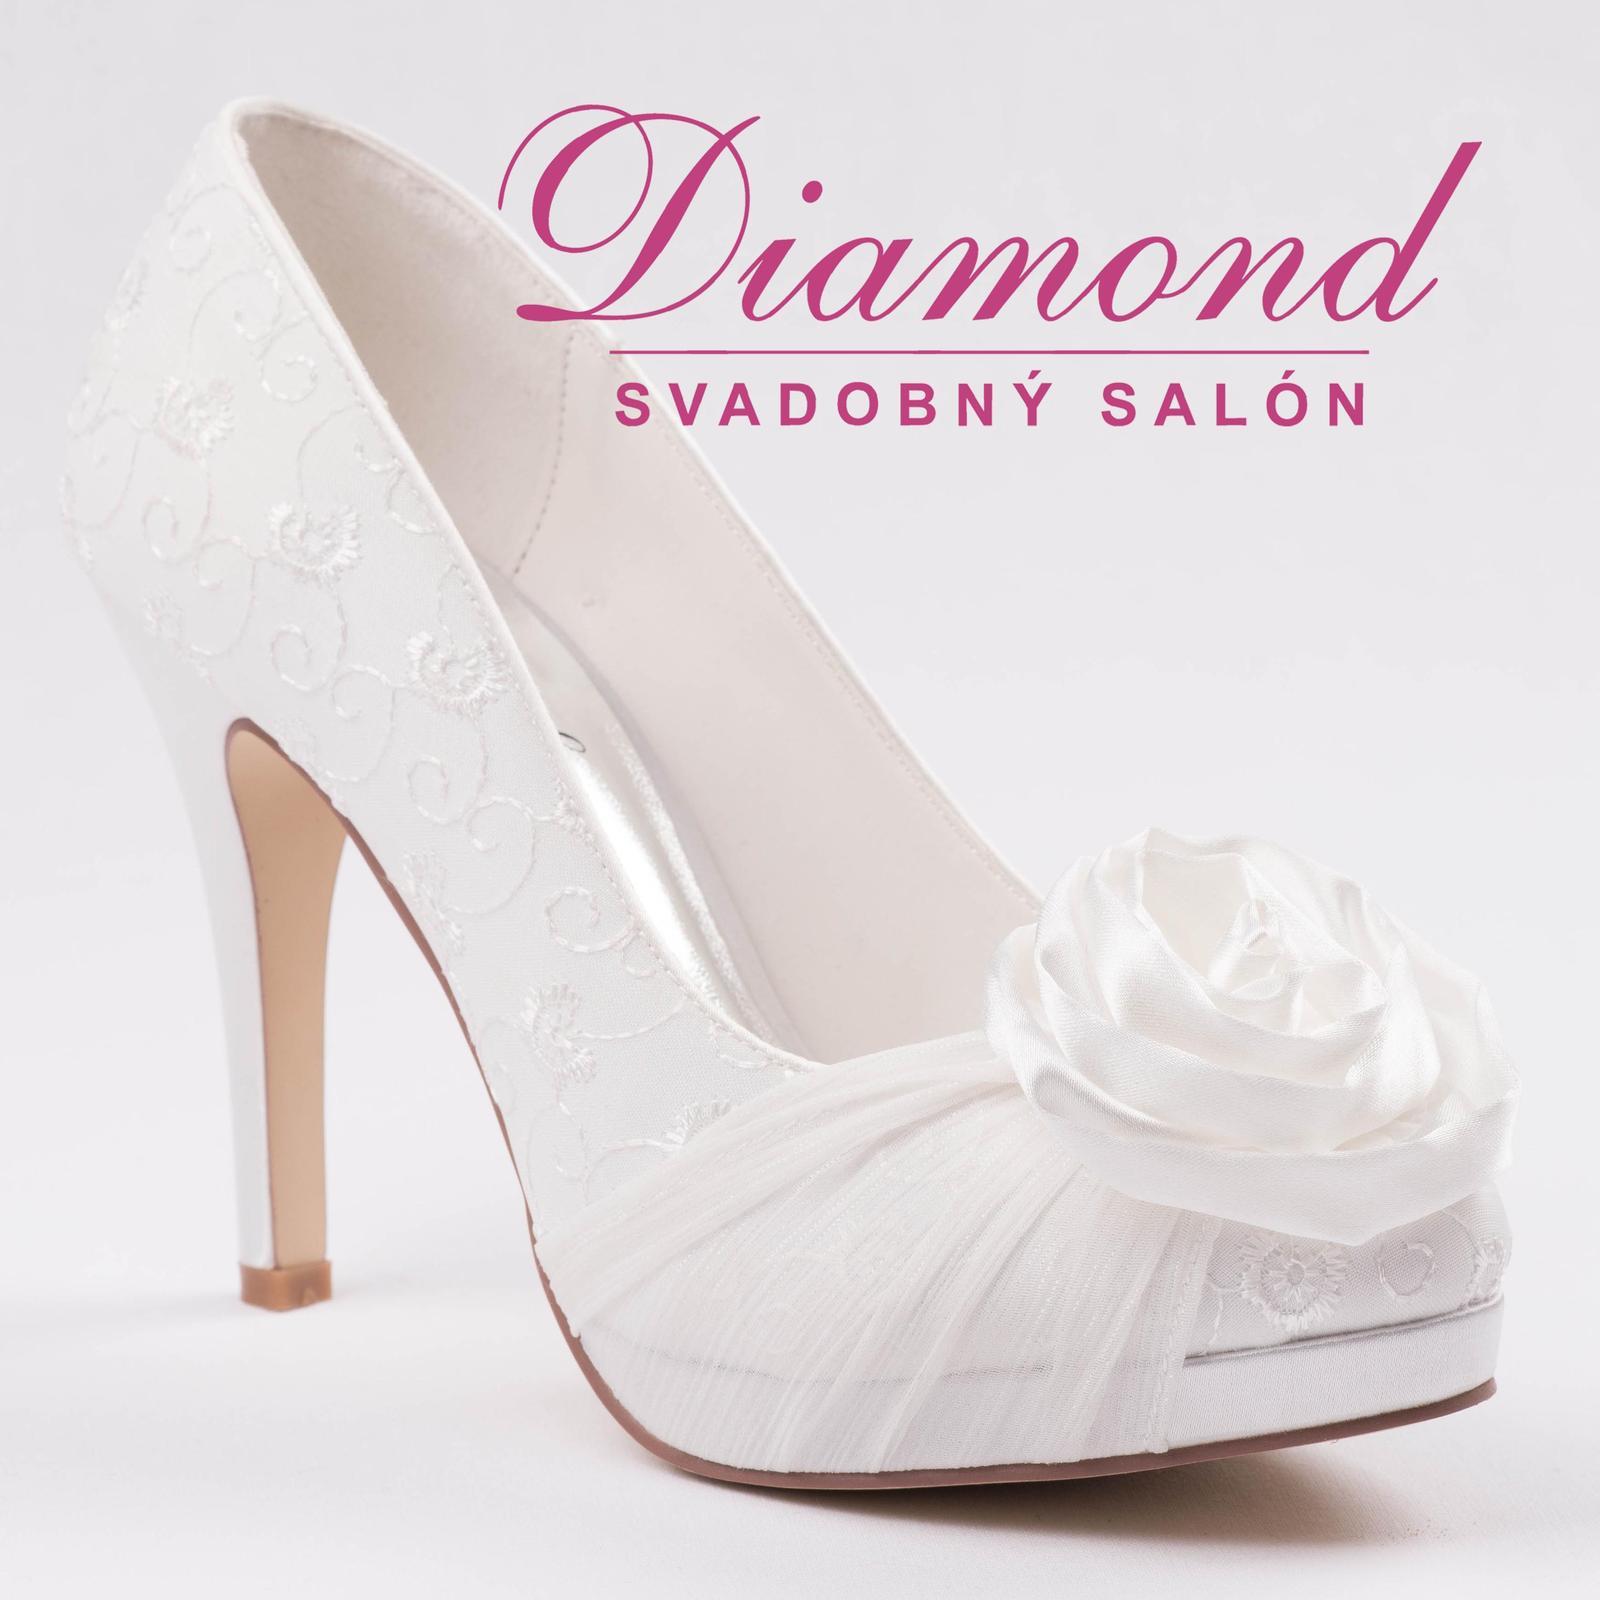 Svadobné topánky - RS 0741B - Obrázok č. 1